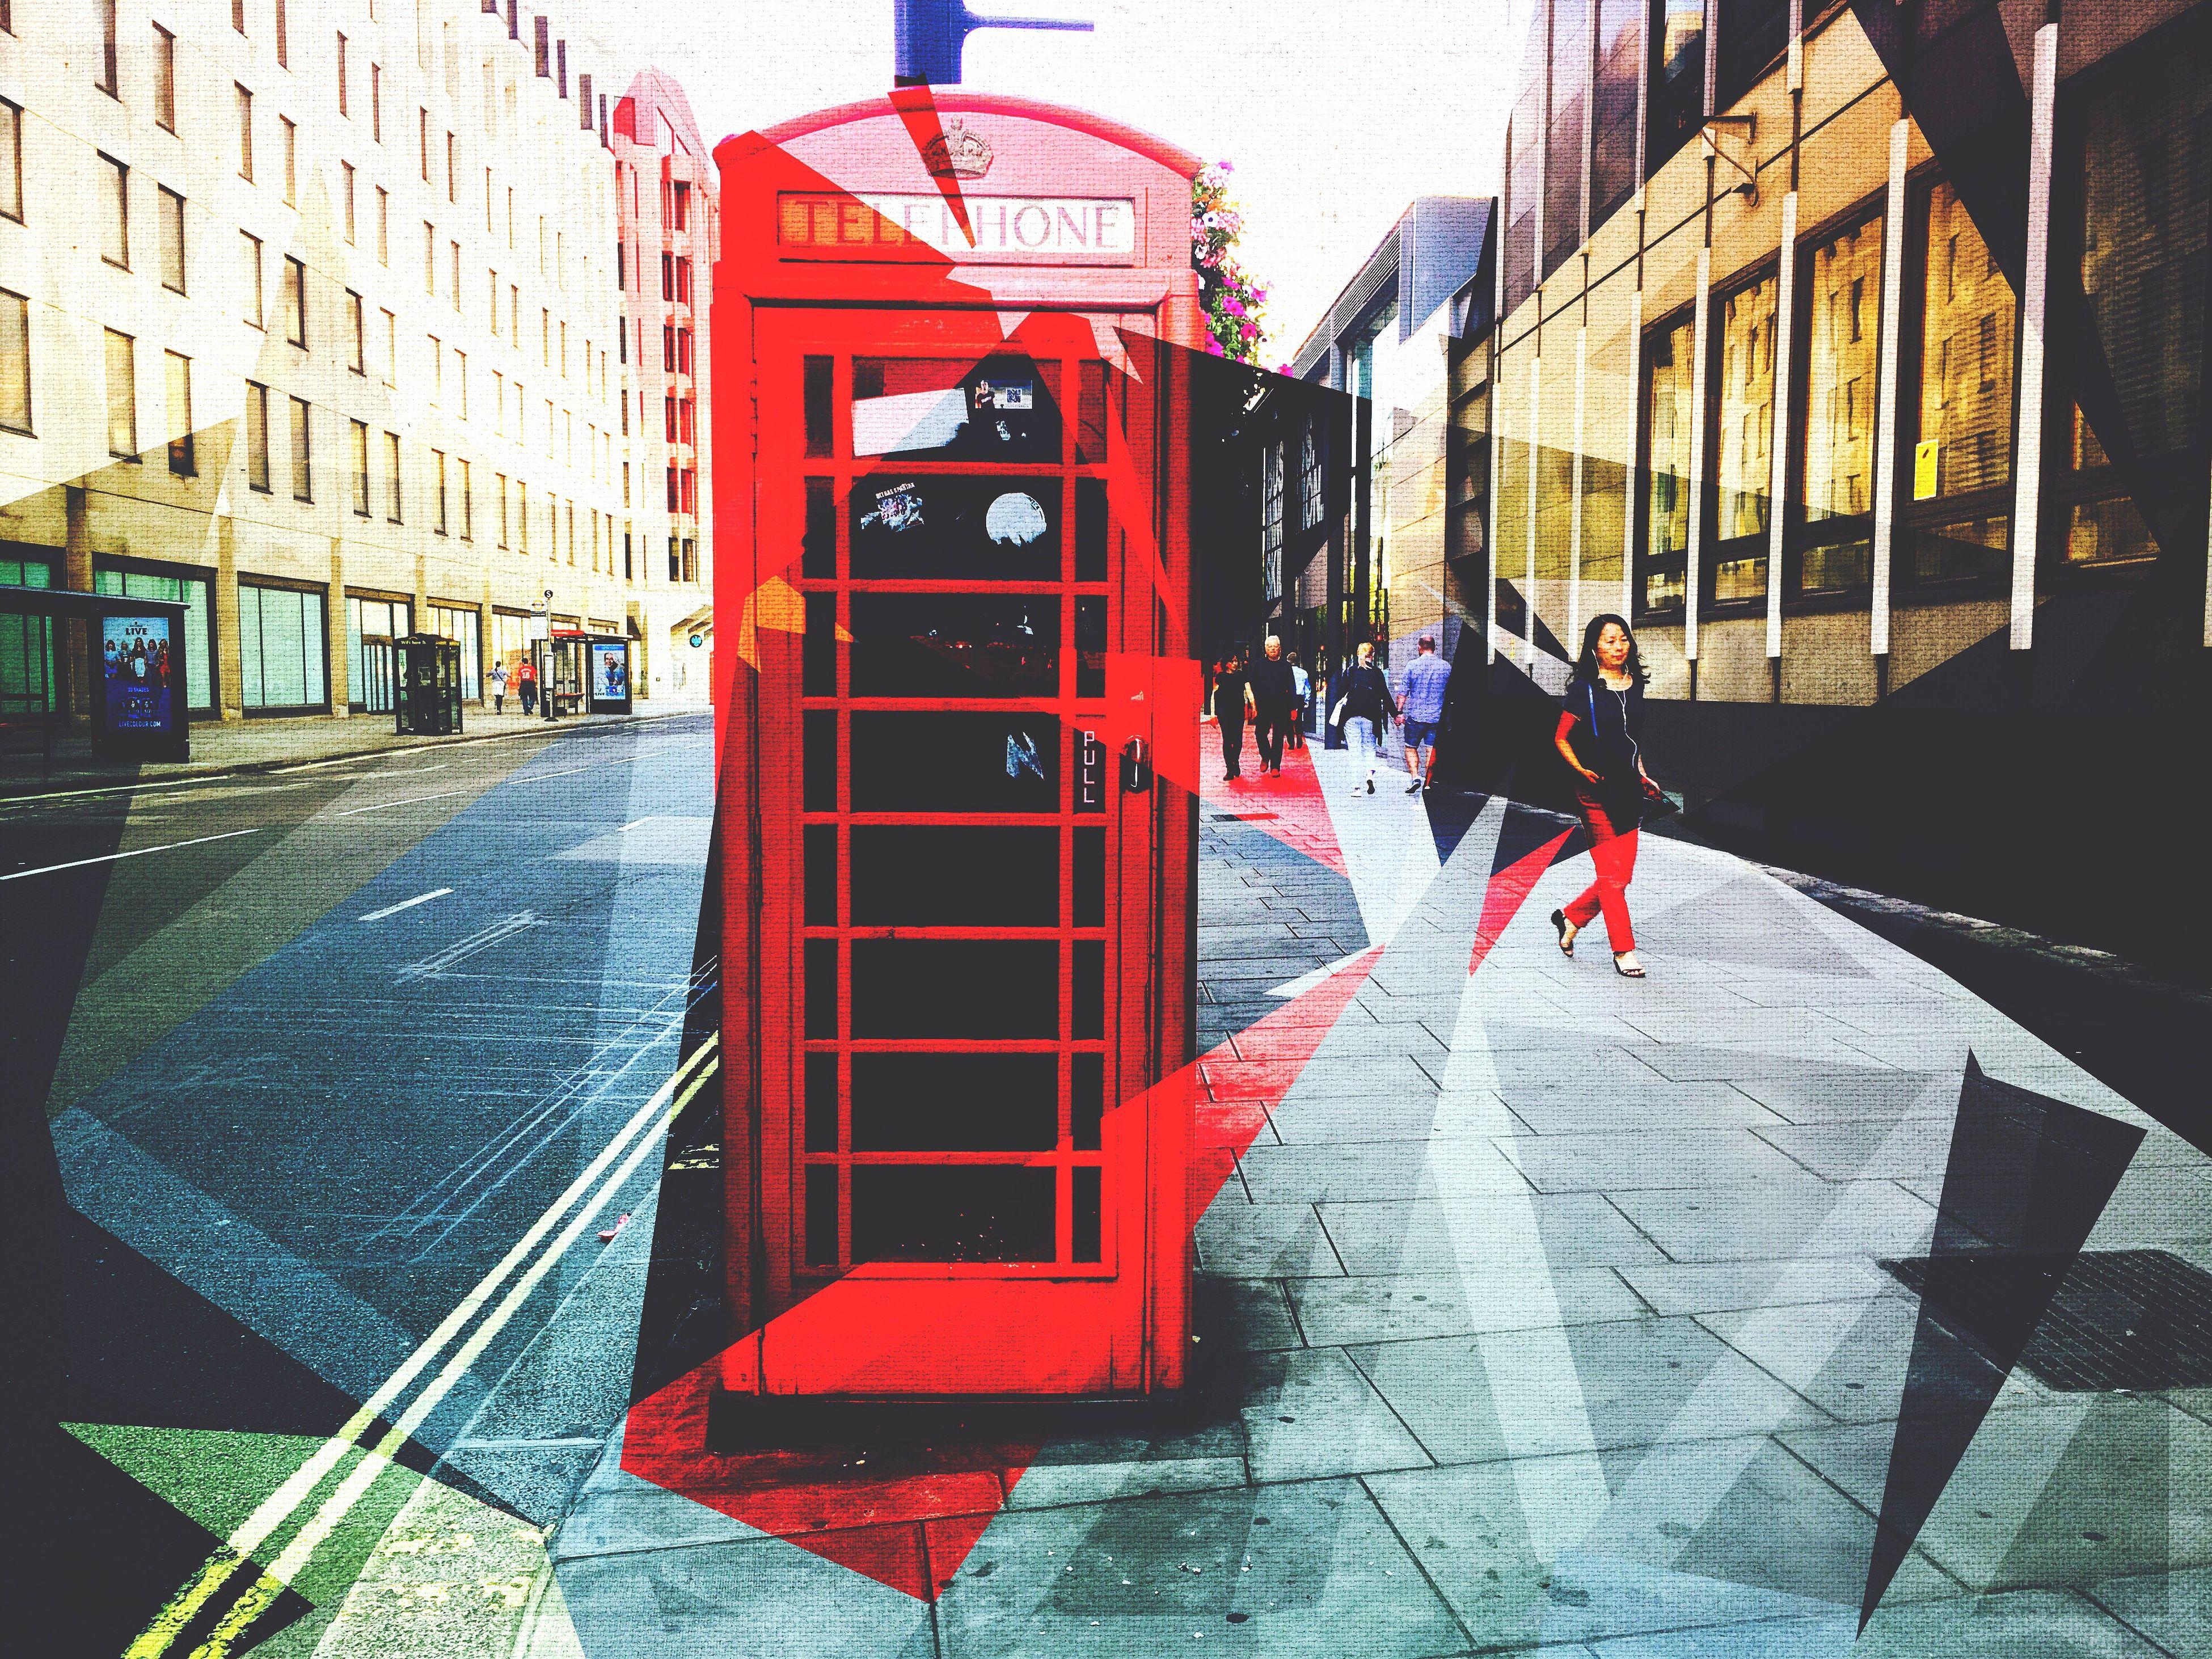 Architecture Red Street Telephone Booth Modern Digital Art Eyeemphoto